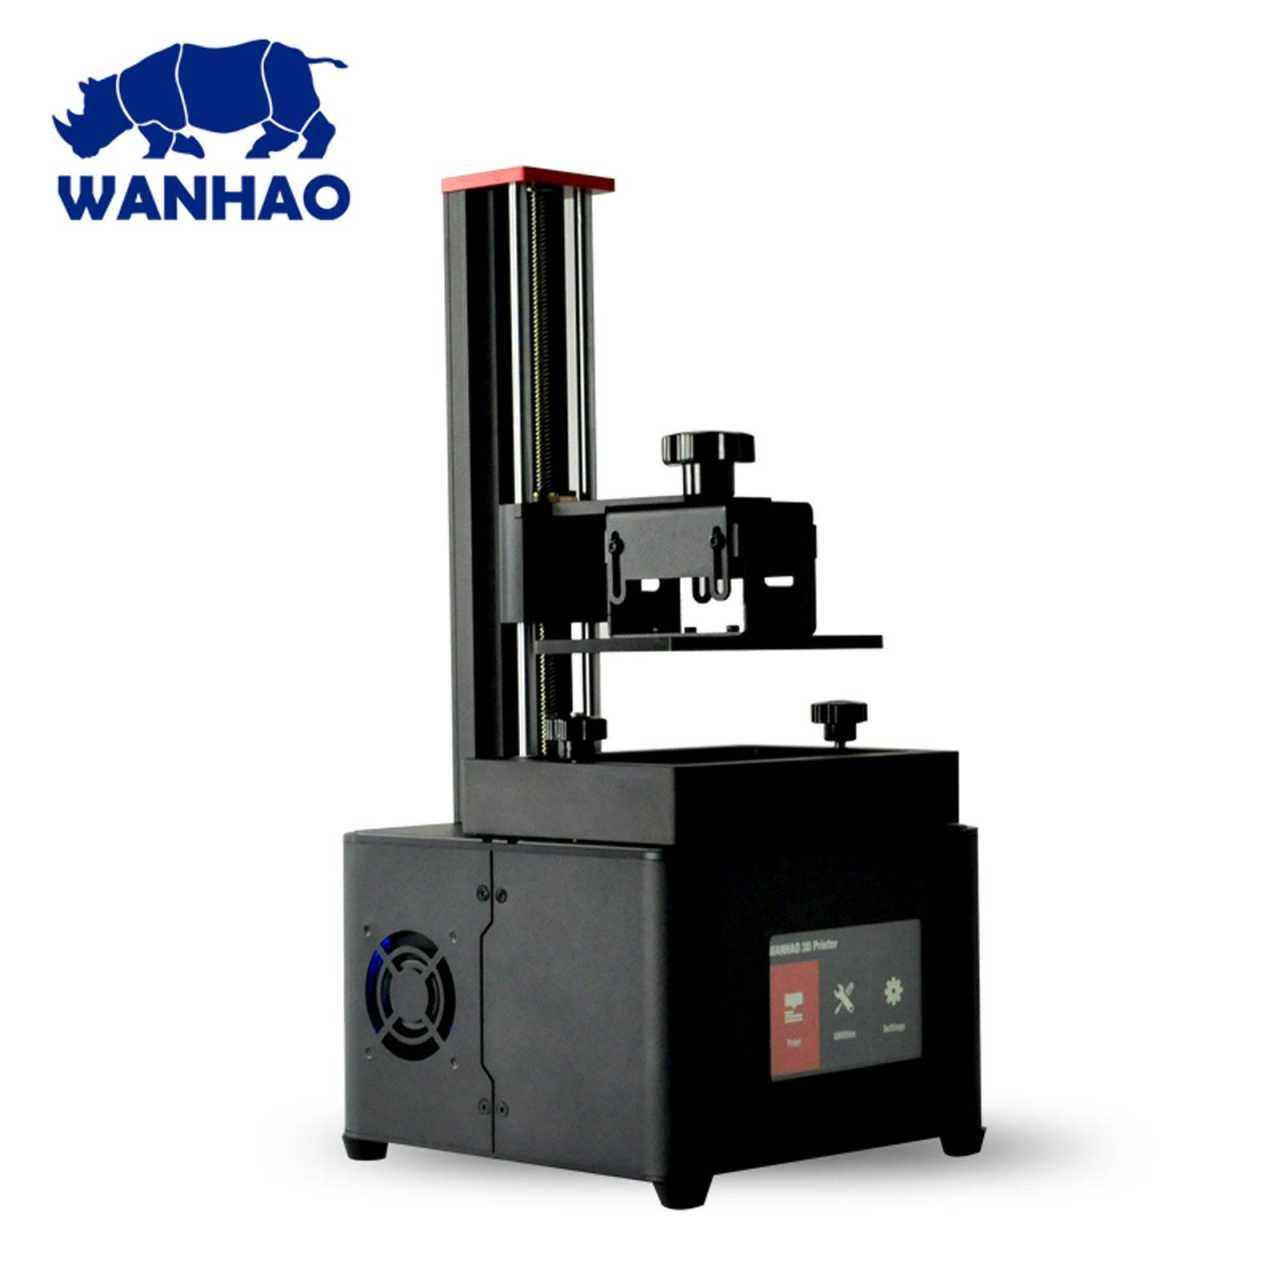 Wanhao Duplicator 7 Plus Resin DLP 3D Drucker 121x68x180mm USB WLAN DRUWAN08